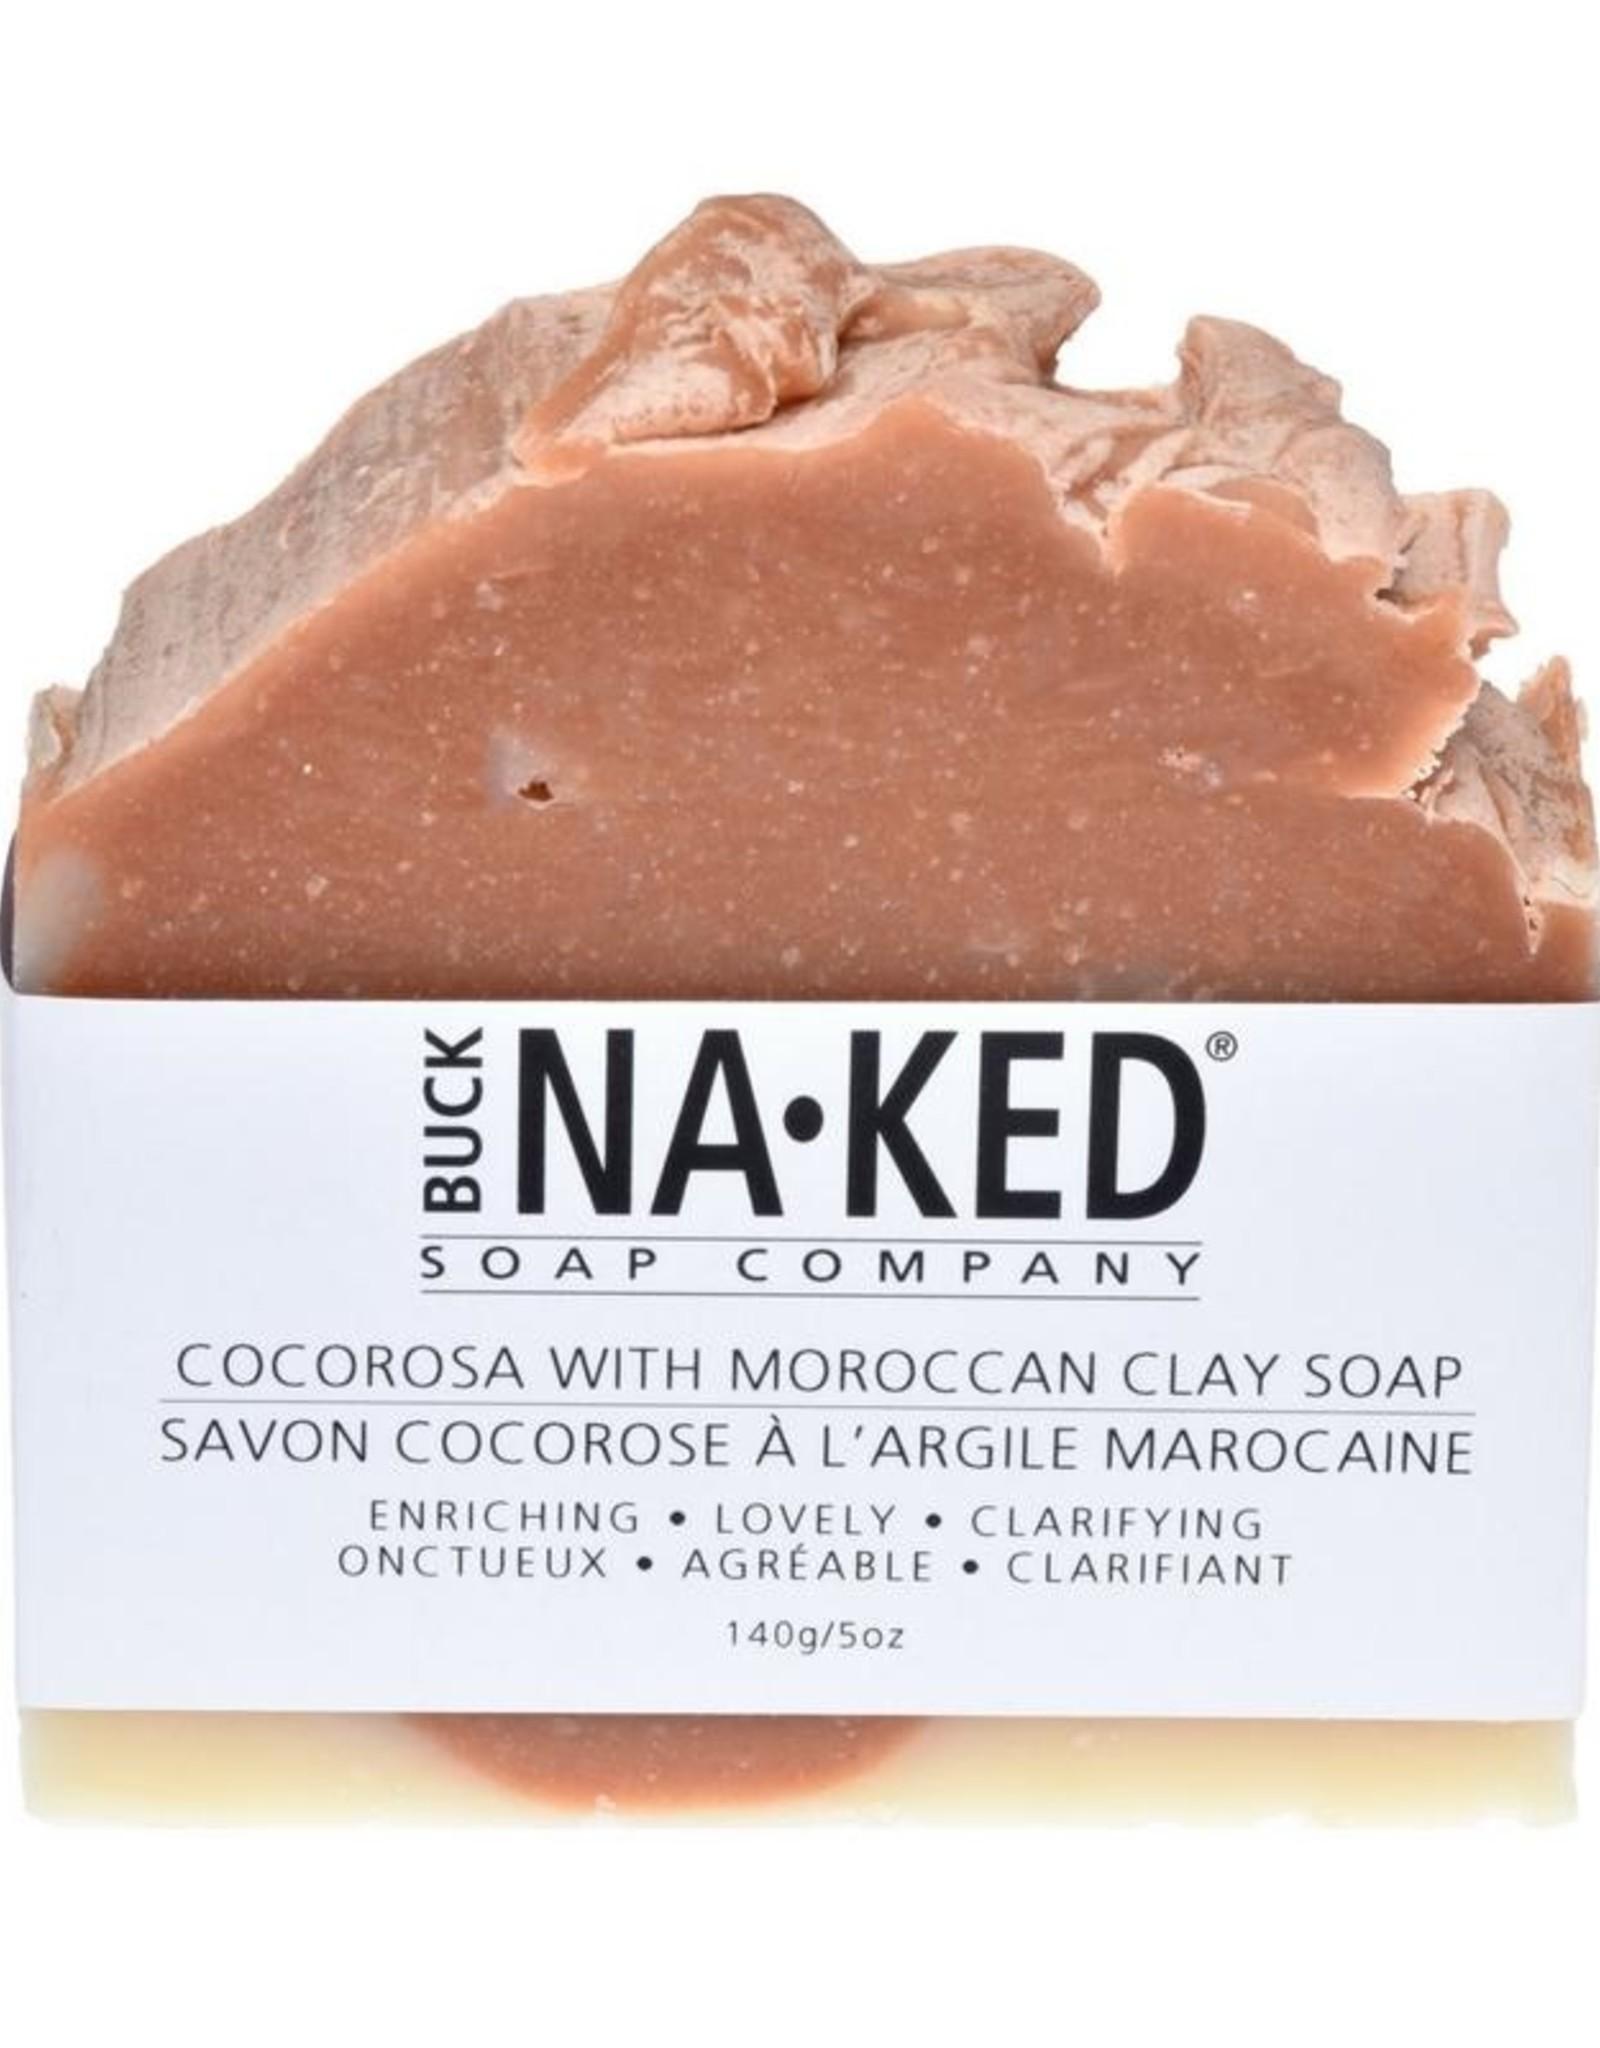 BUCK NAKED CocoRosa & Moroccan Clay SOAP